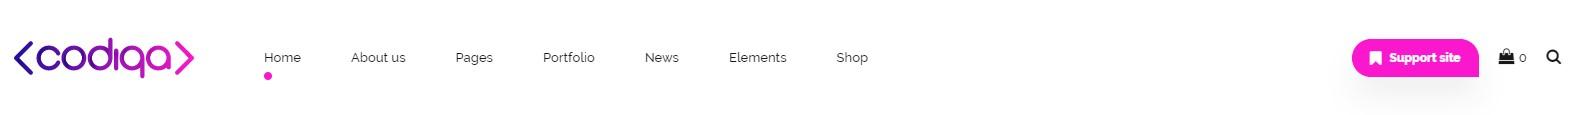 https://documentation.bold-themes.com/codiqa/wp-content/uploads/sites/49/2019/10/header-transparent-dark.jpg